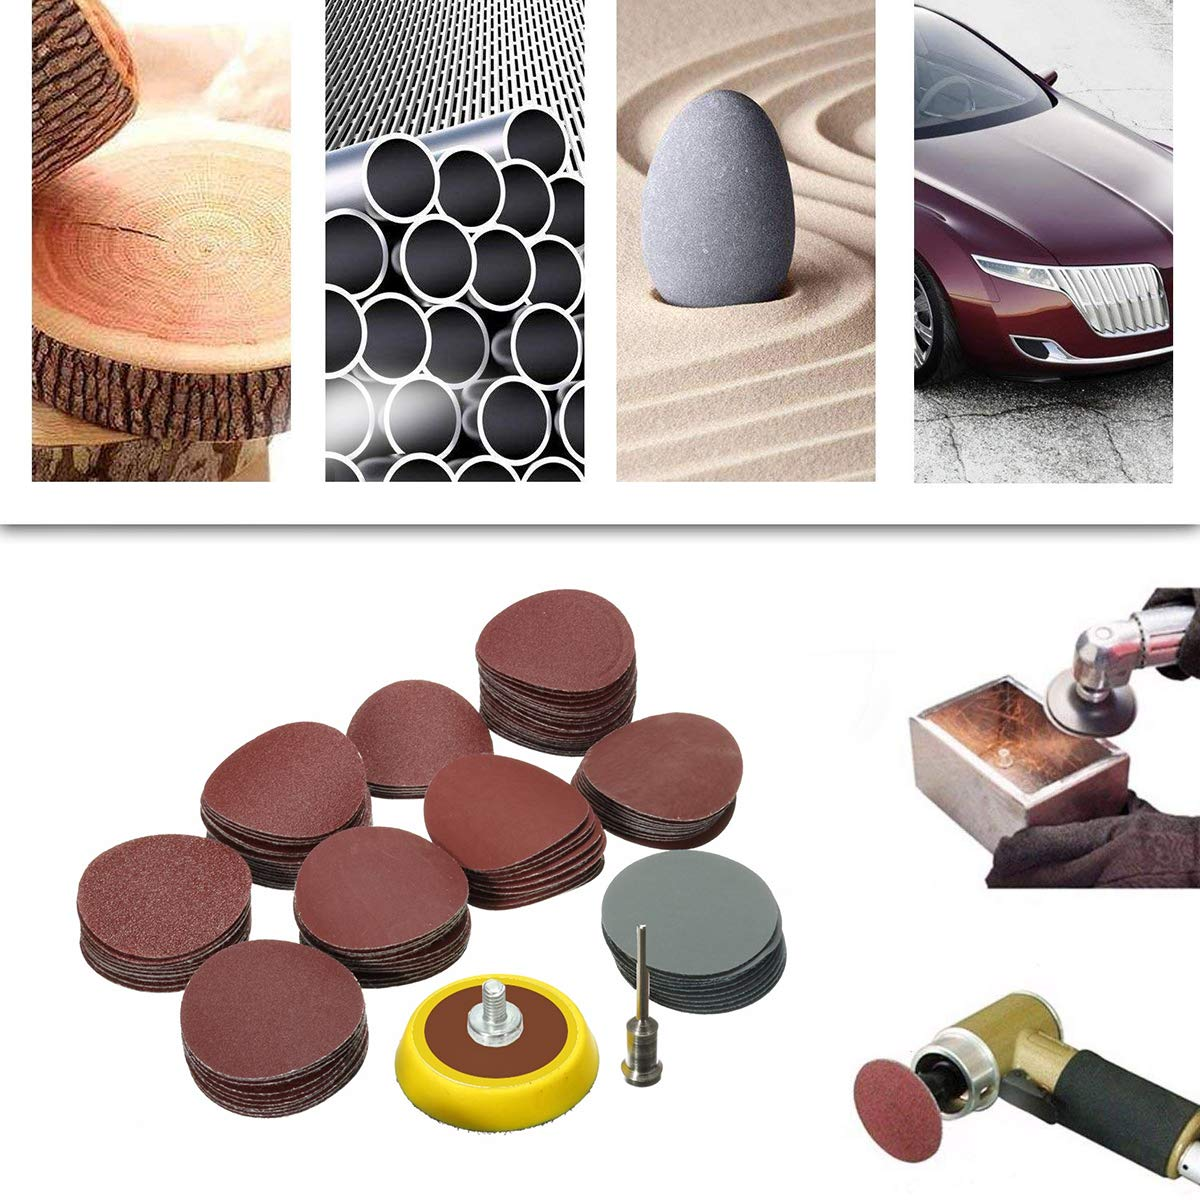 SAFETYON 102pcs Sandpaper Set with Backing Pad 1 Inch, Sandpaper 80 - 5000g, Sanding with Sanding Pad and Shaft